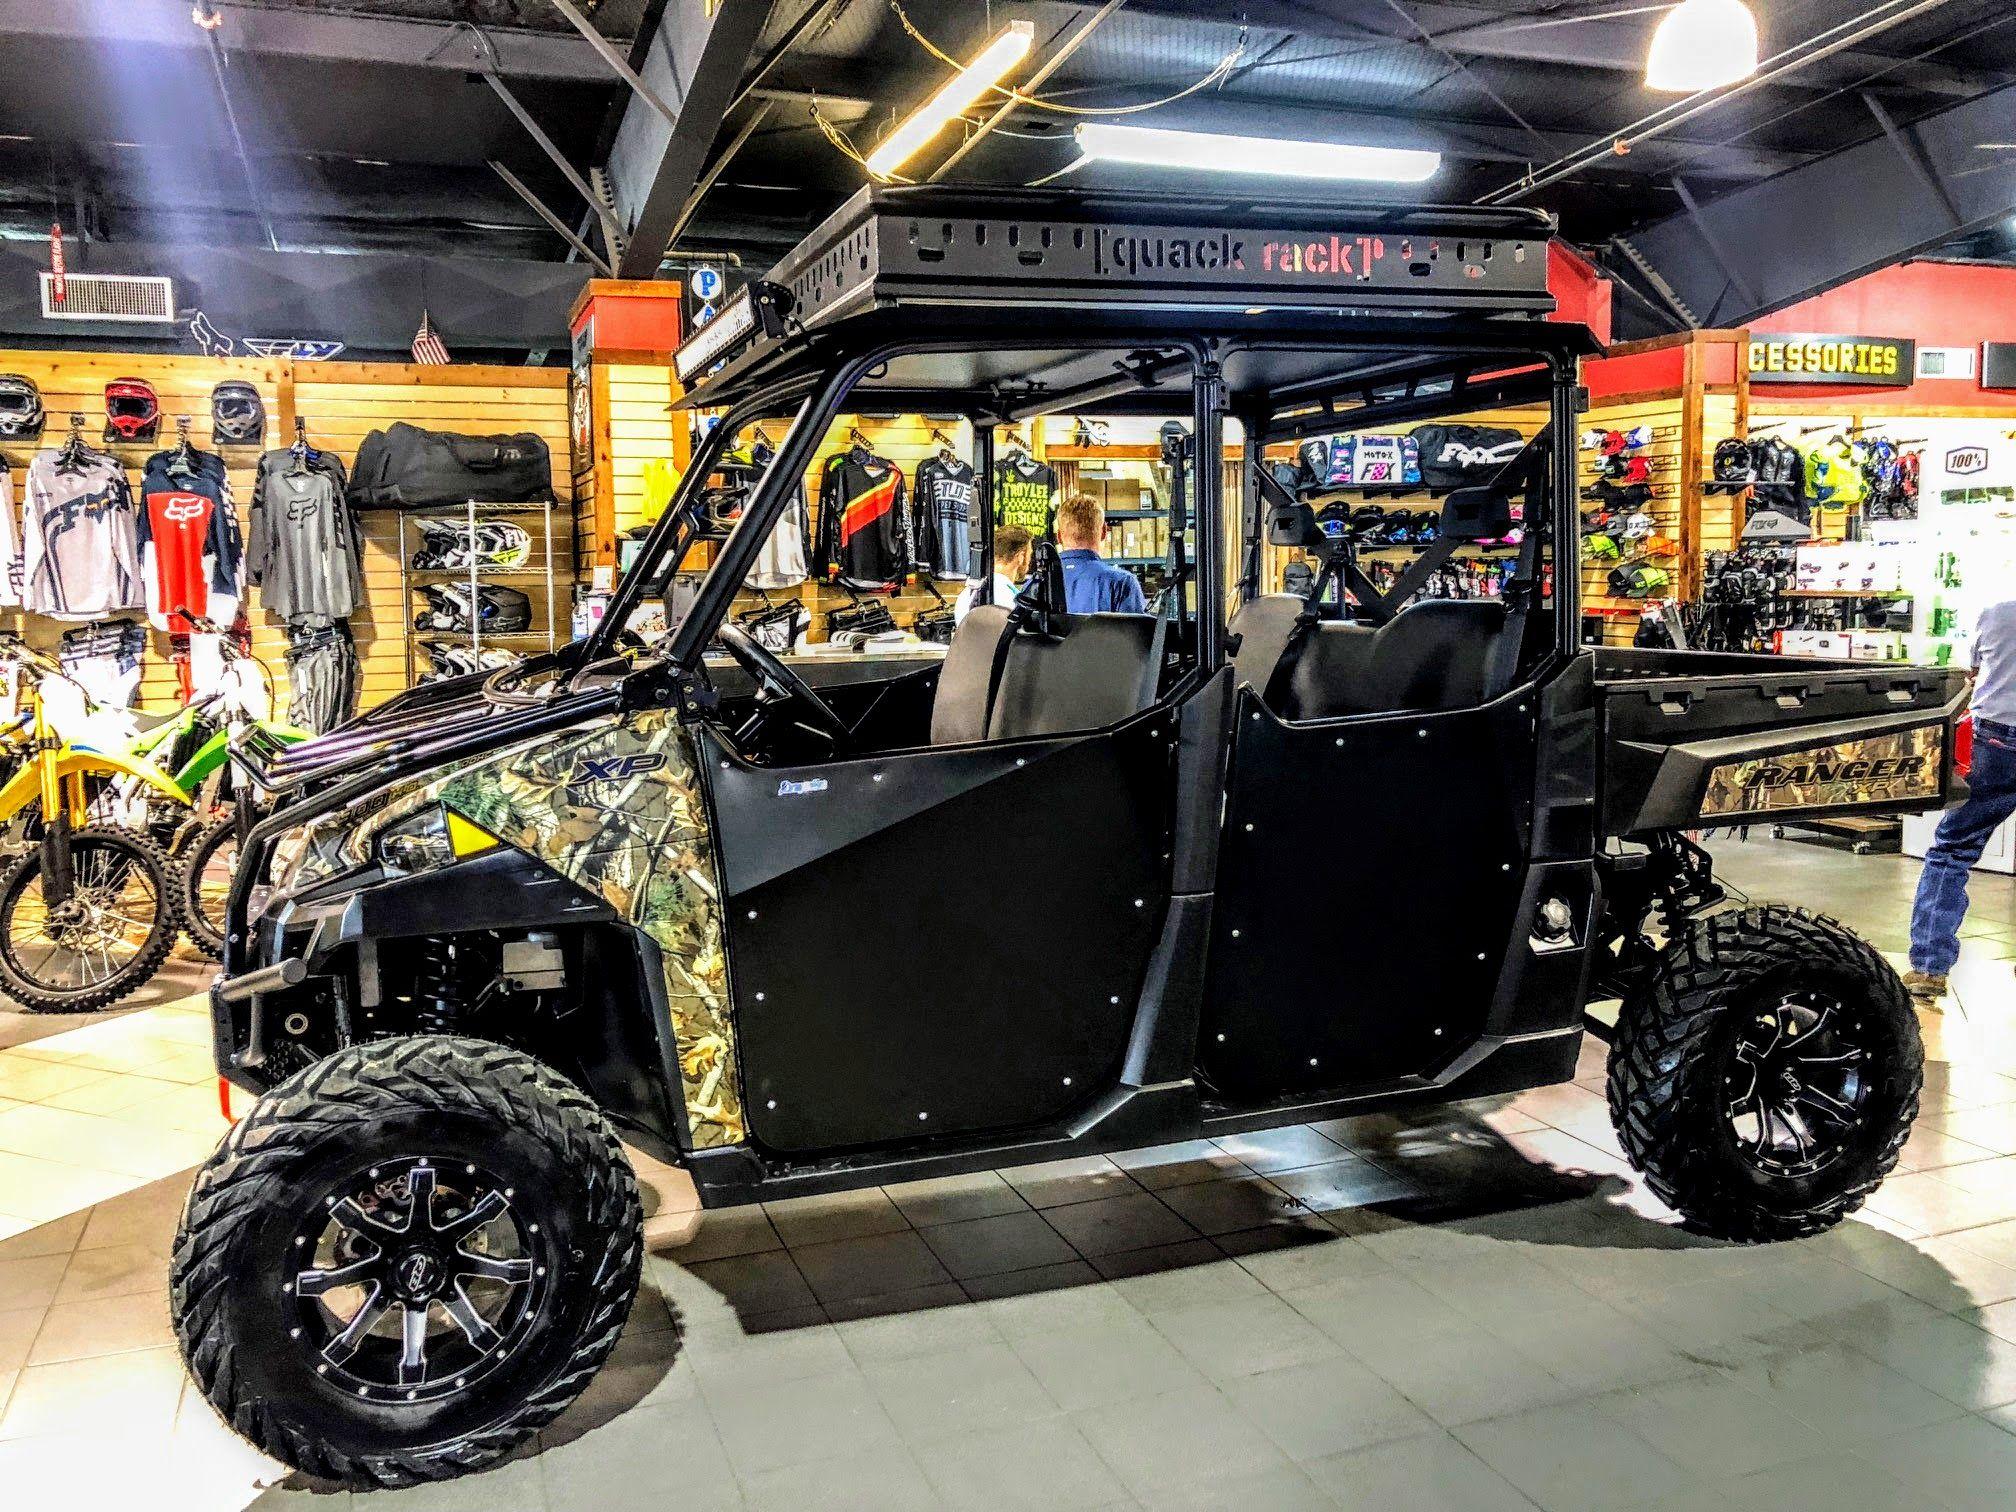 Wc3 S Latest Build A Camo Ranger 900 Crew With A Custom Quack Rack Half Doors Lift Wheels And Tires Are You Rea Half Doors Polaris Ranger Wheels And Tires